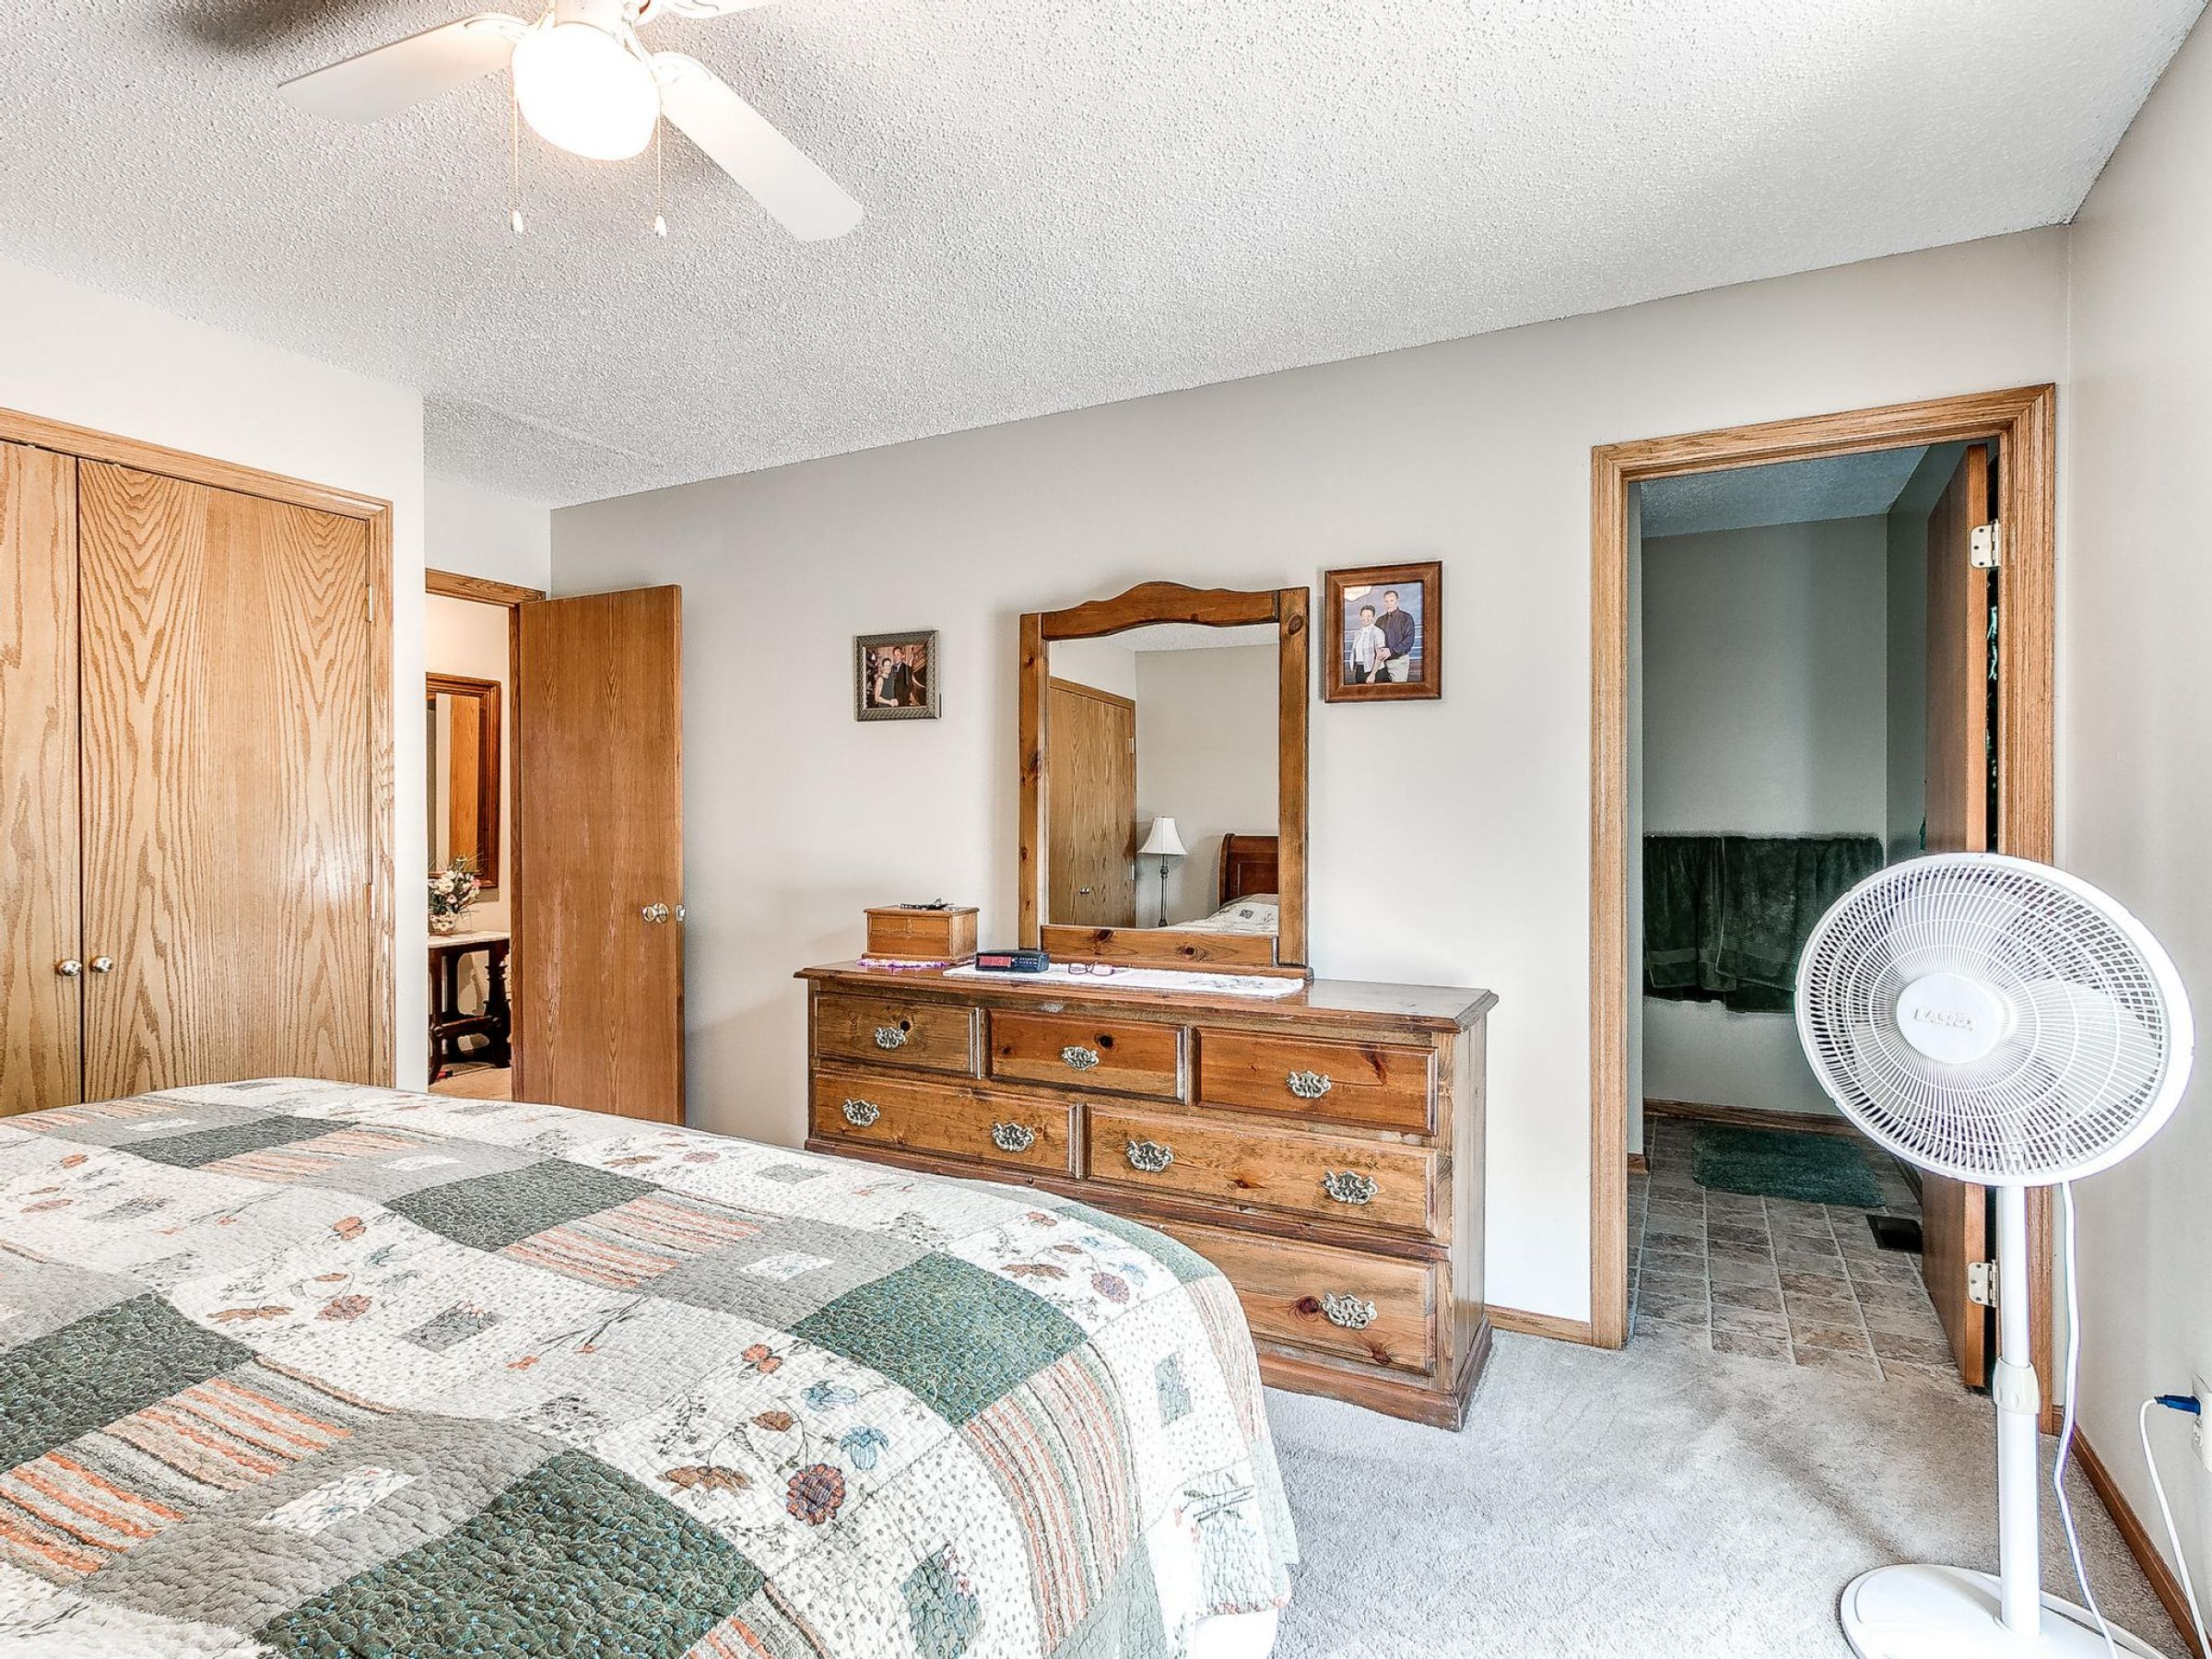 residential-warren-county-iowa-3-acres-listing-number-15593-4-2021-06-18-155706.jpg